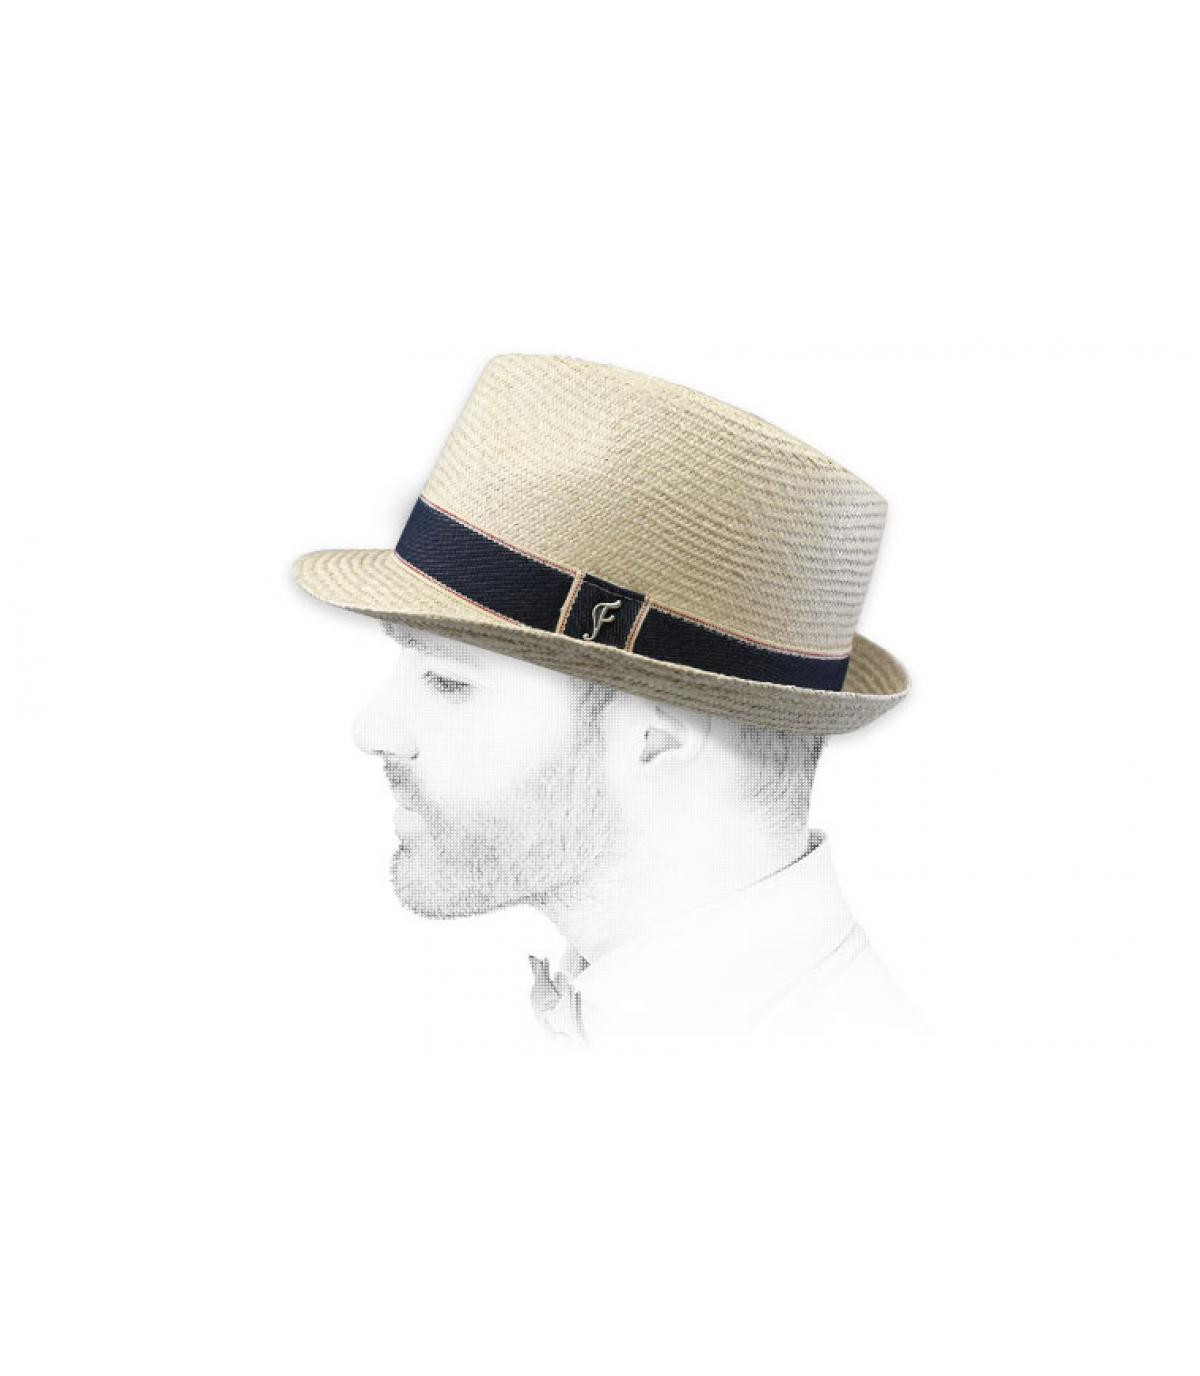 Trilby Strohhut beige